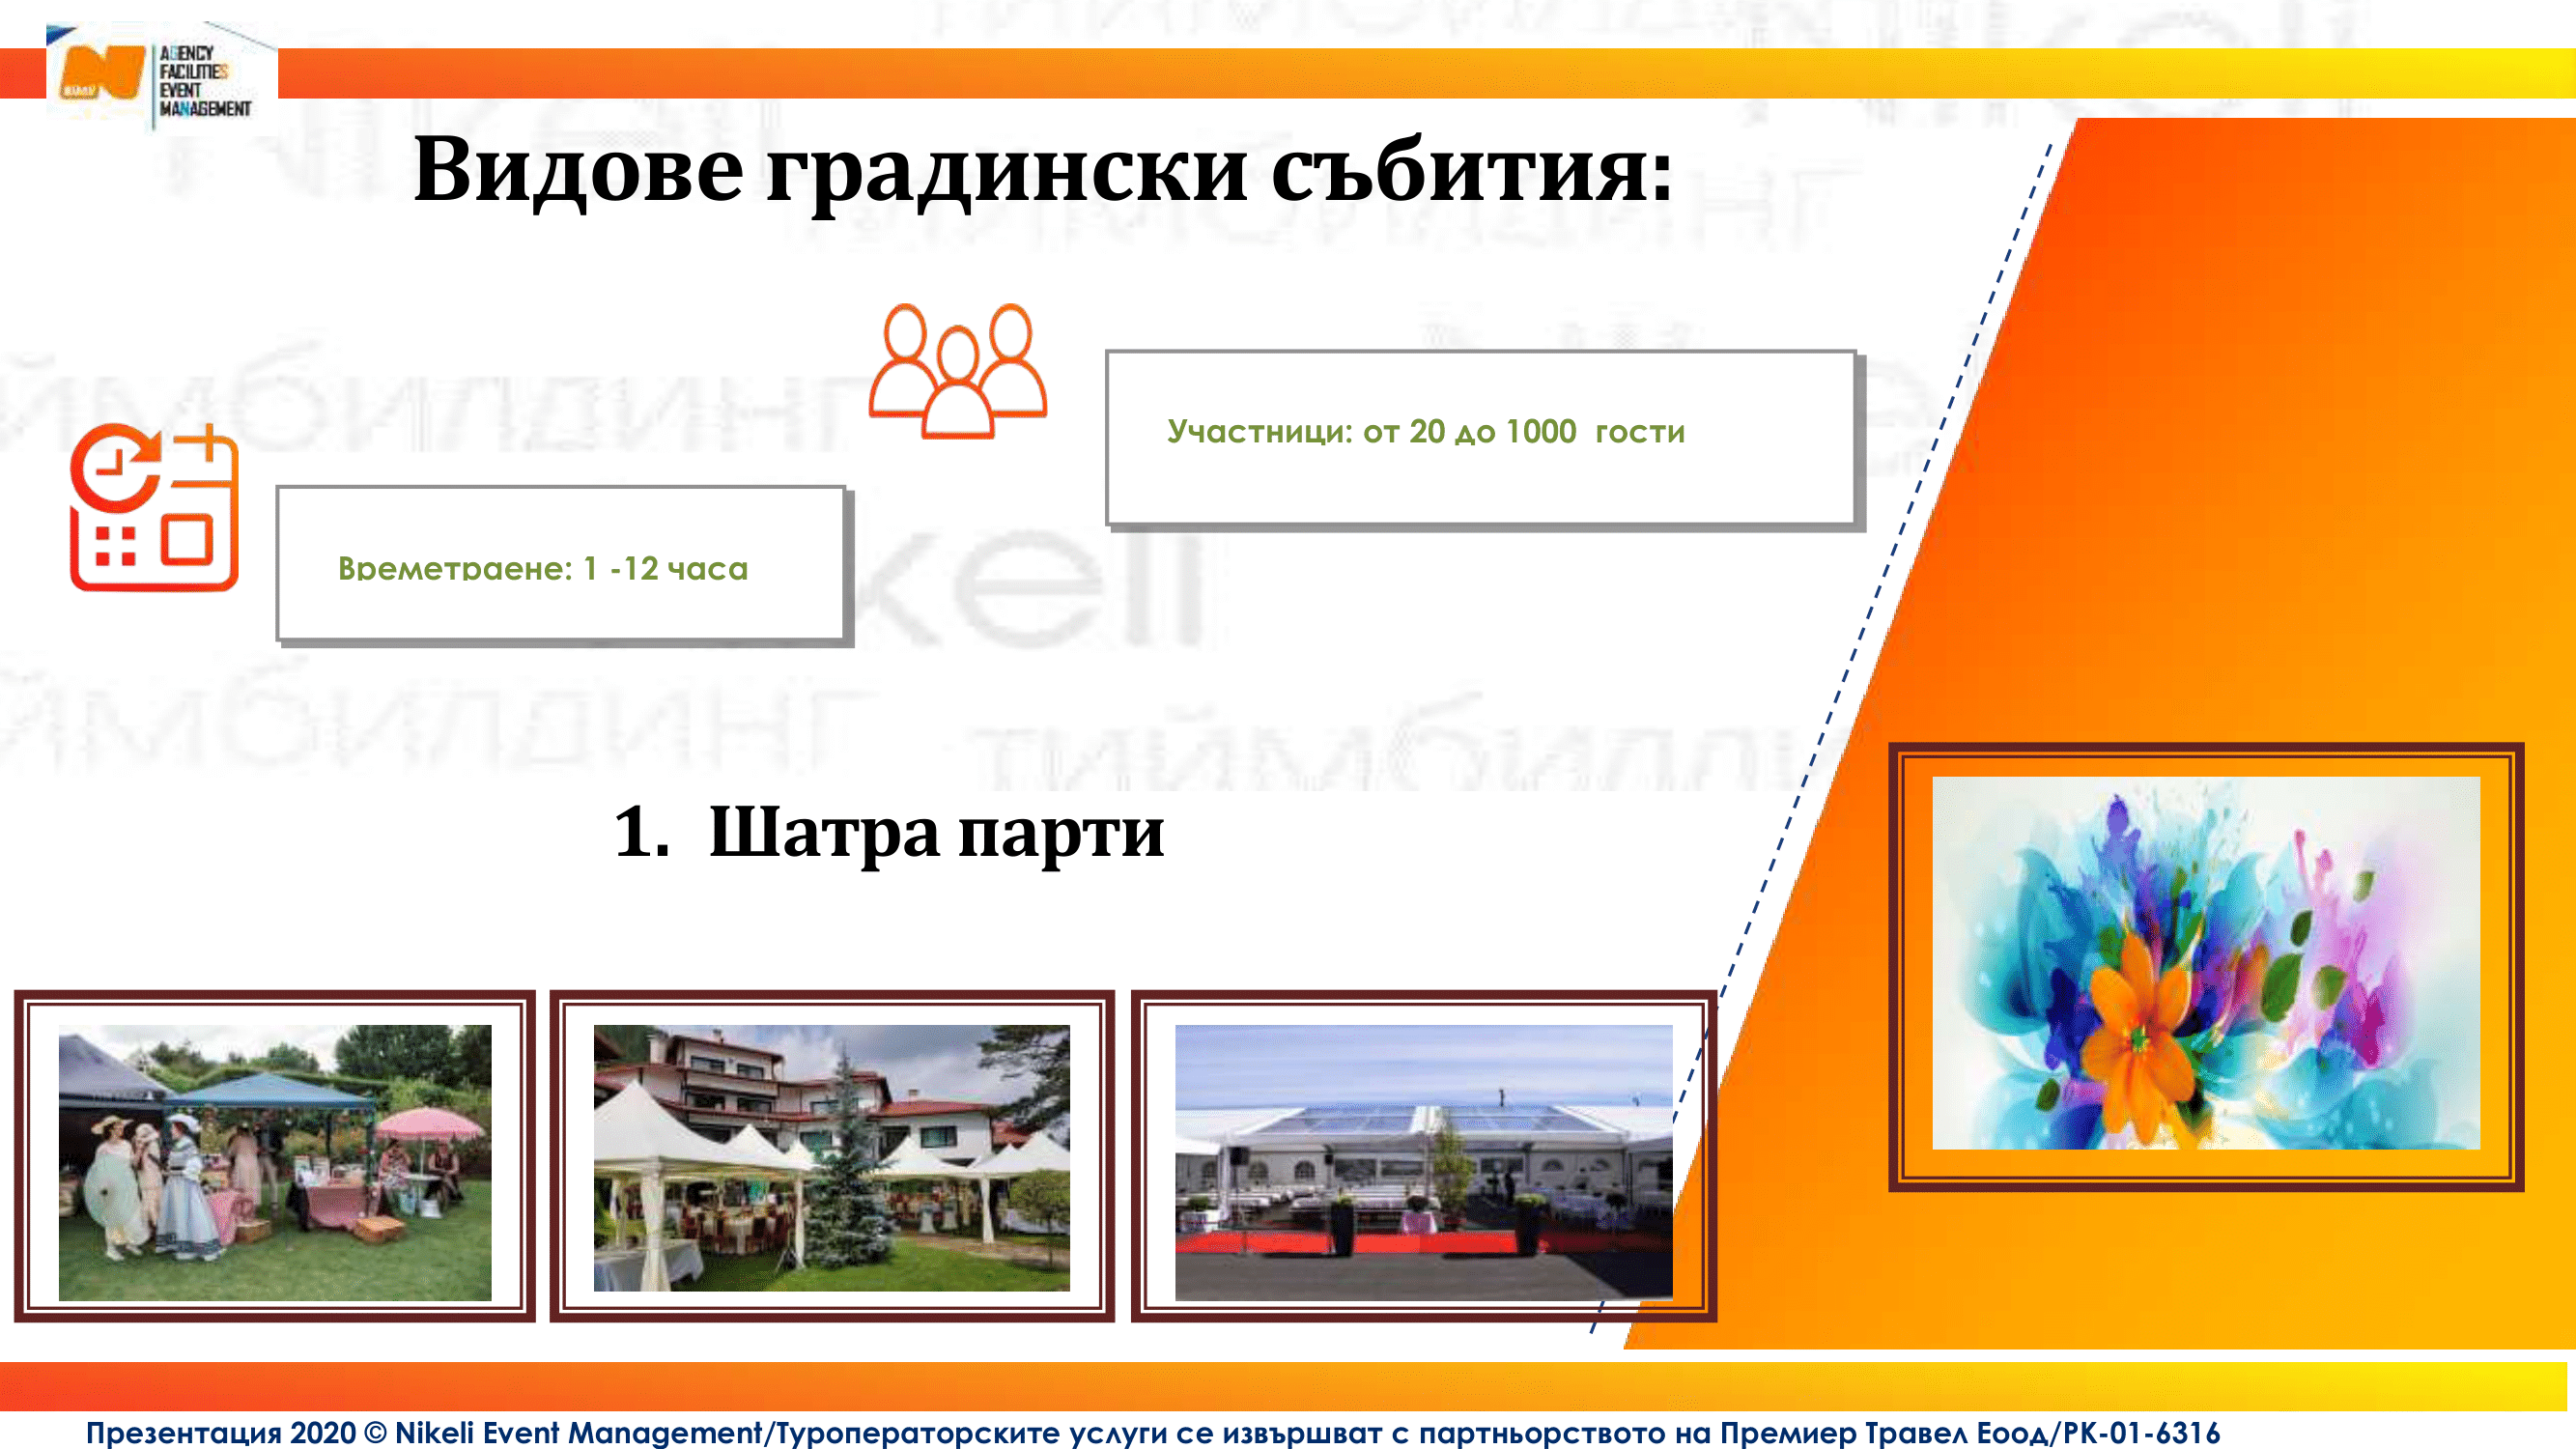 TeamBuilding-Nikeli-Event-Managemen-REA-2020-10